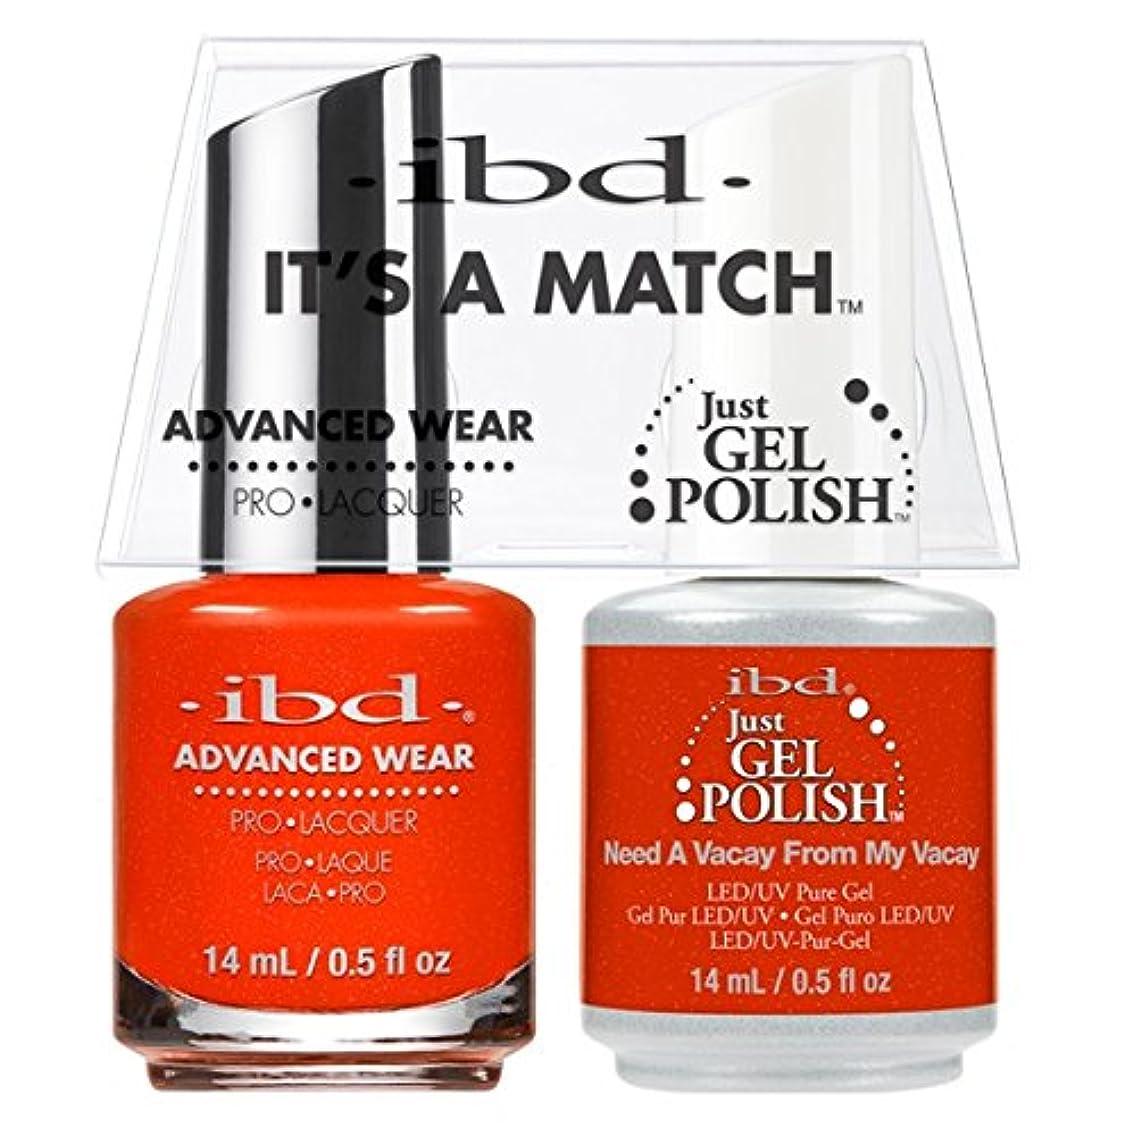 喜ぶ征服者妖精ibd - It's A Match -Duo Pack- Need a Vacay From My Vacay - 14 mL / 0.5 oz Each